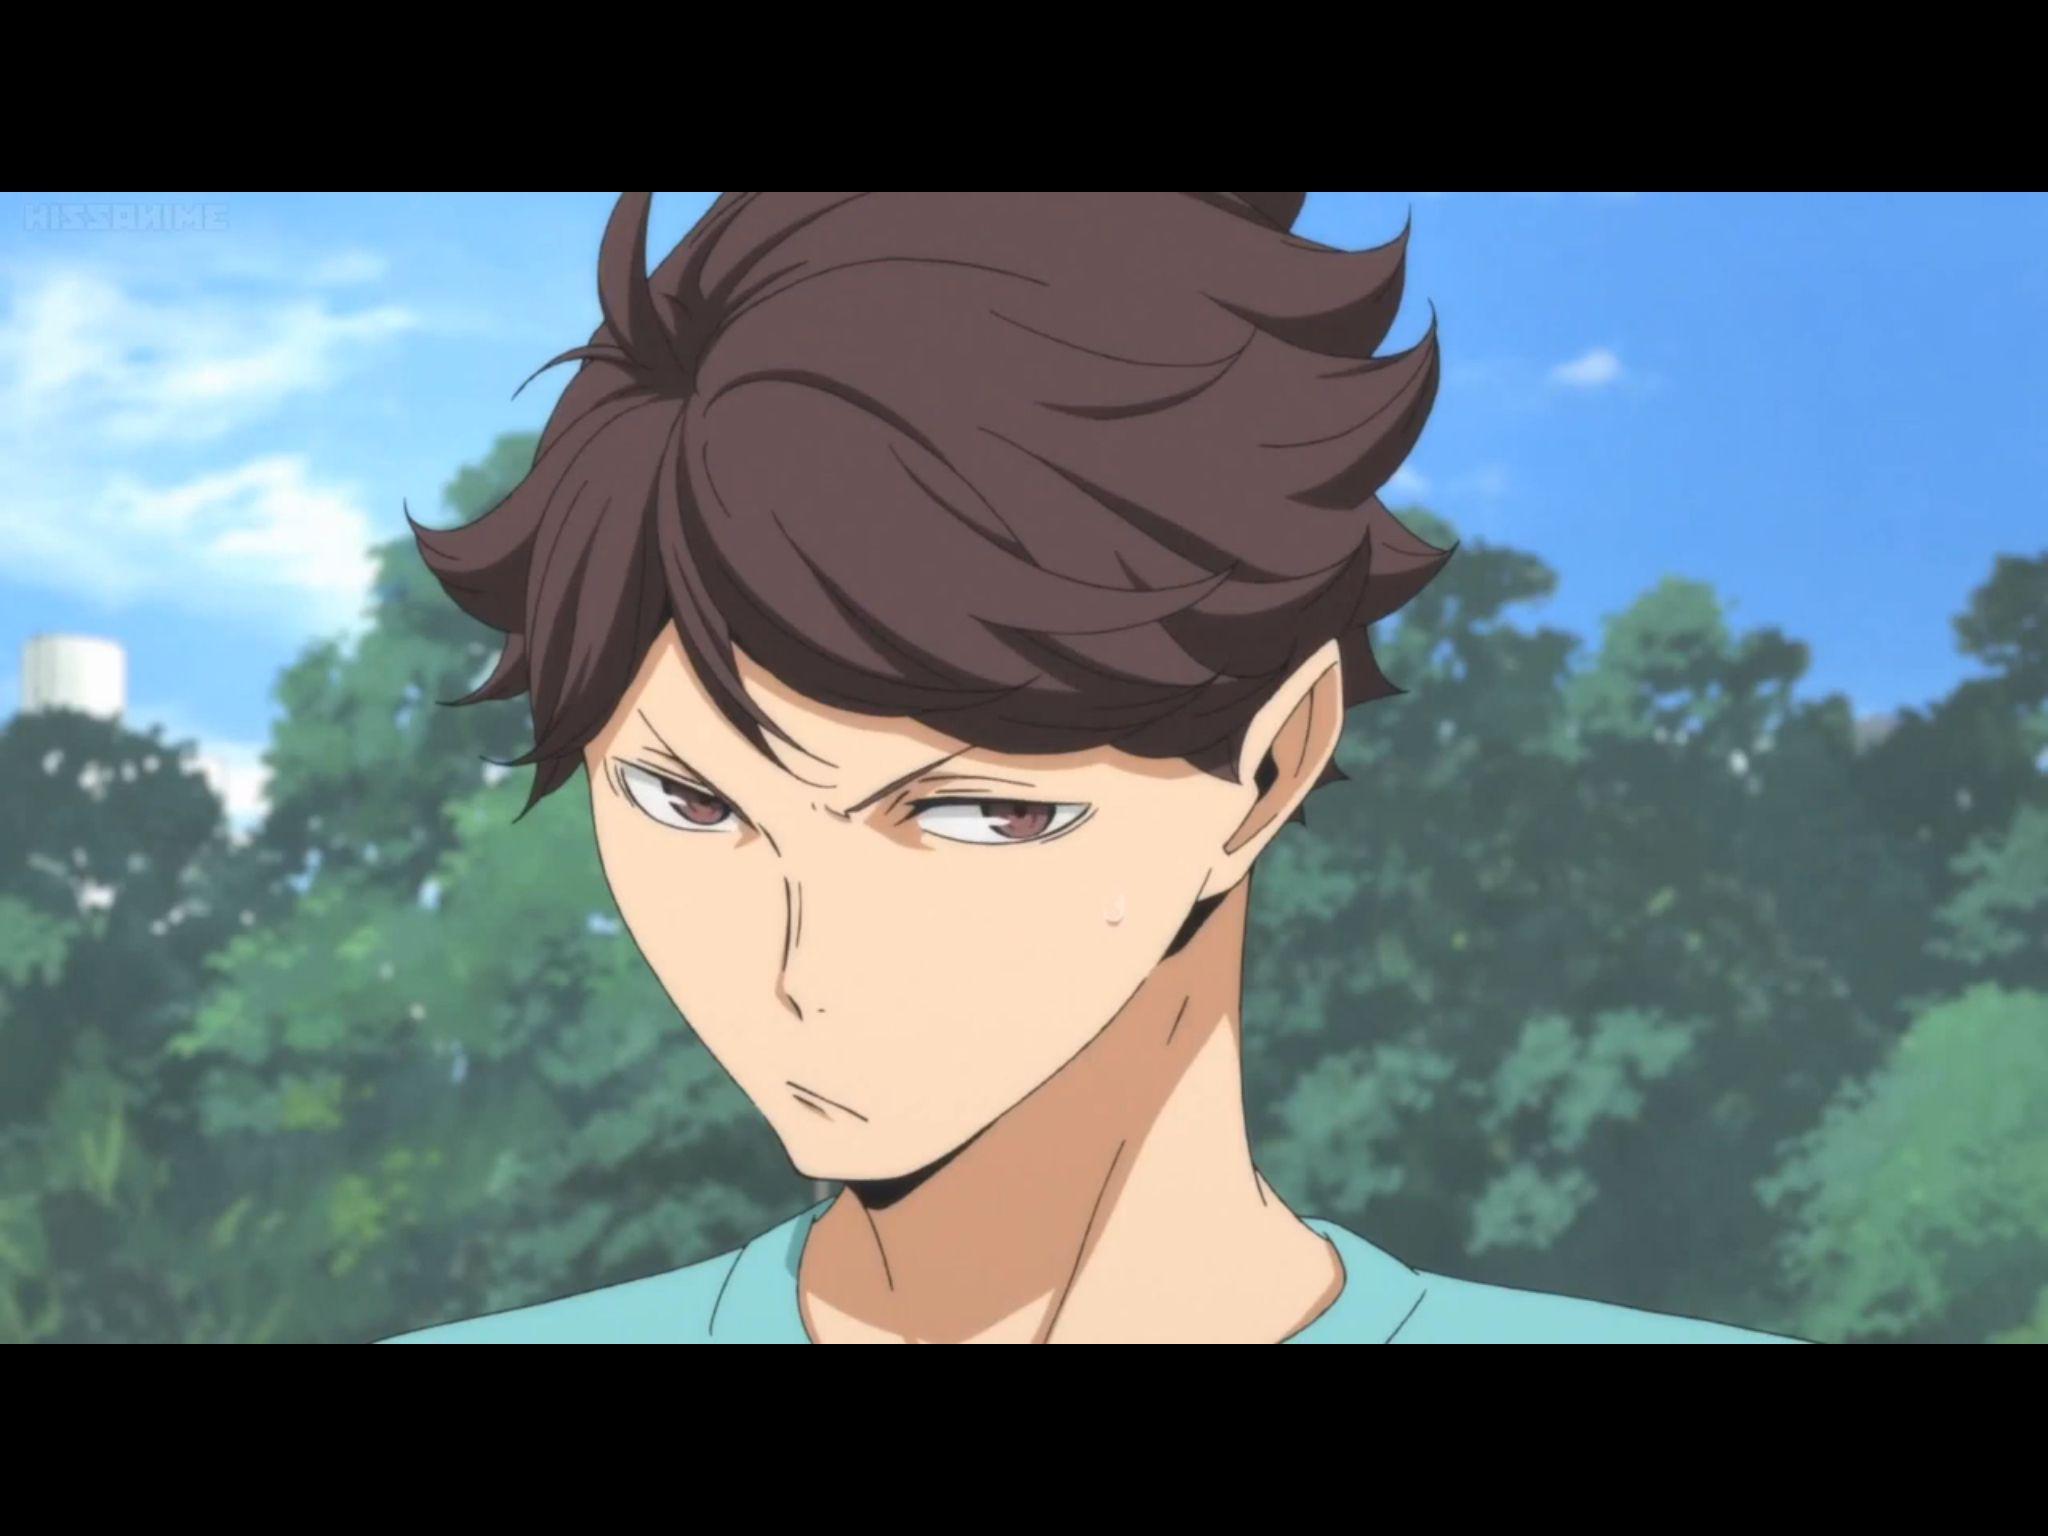 Haikyuu Pouty Face 3 Oikawa Haikyuu Haikyuu Anime